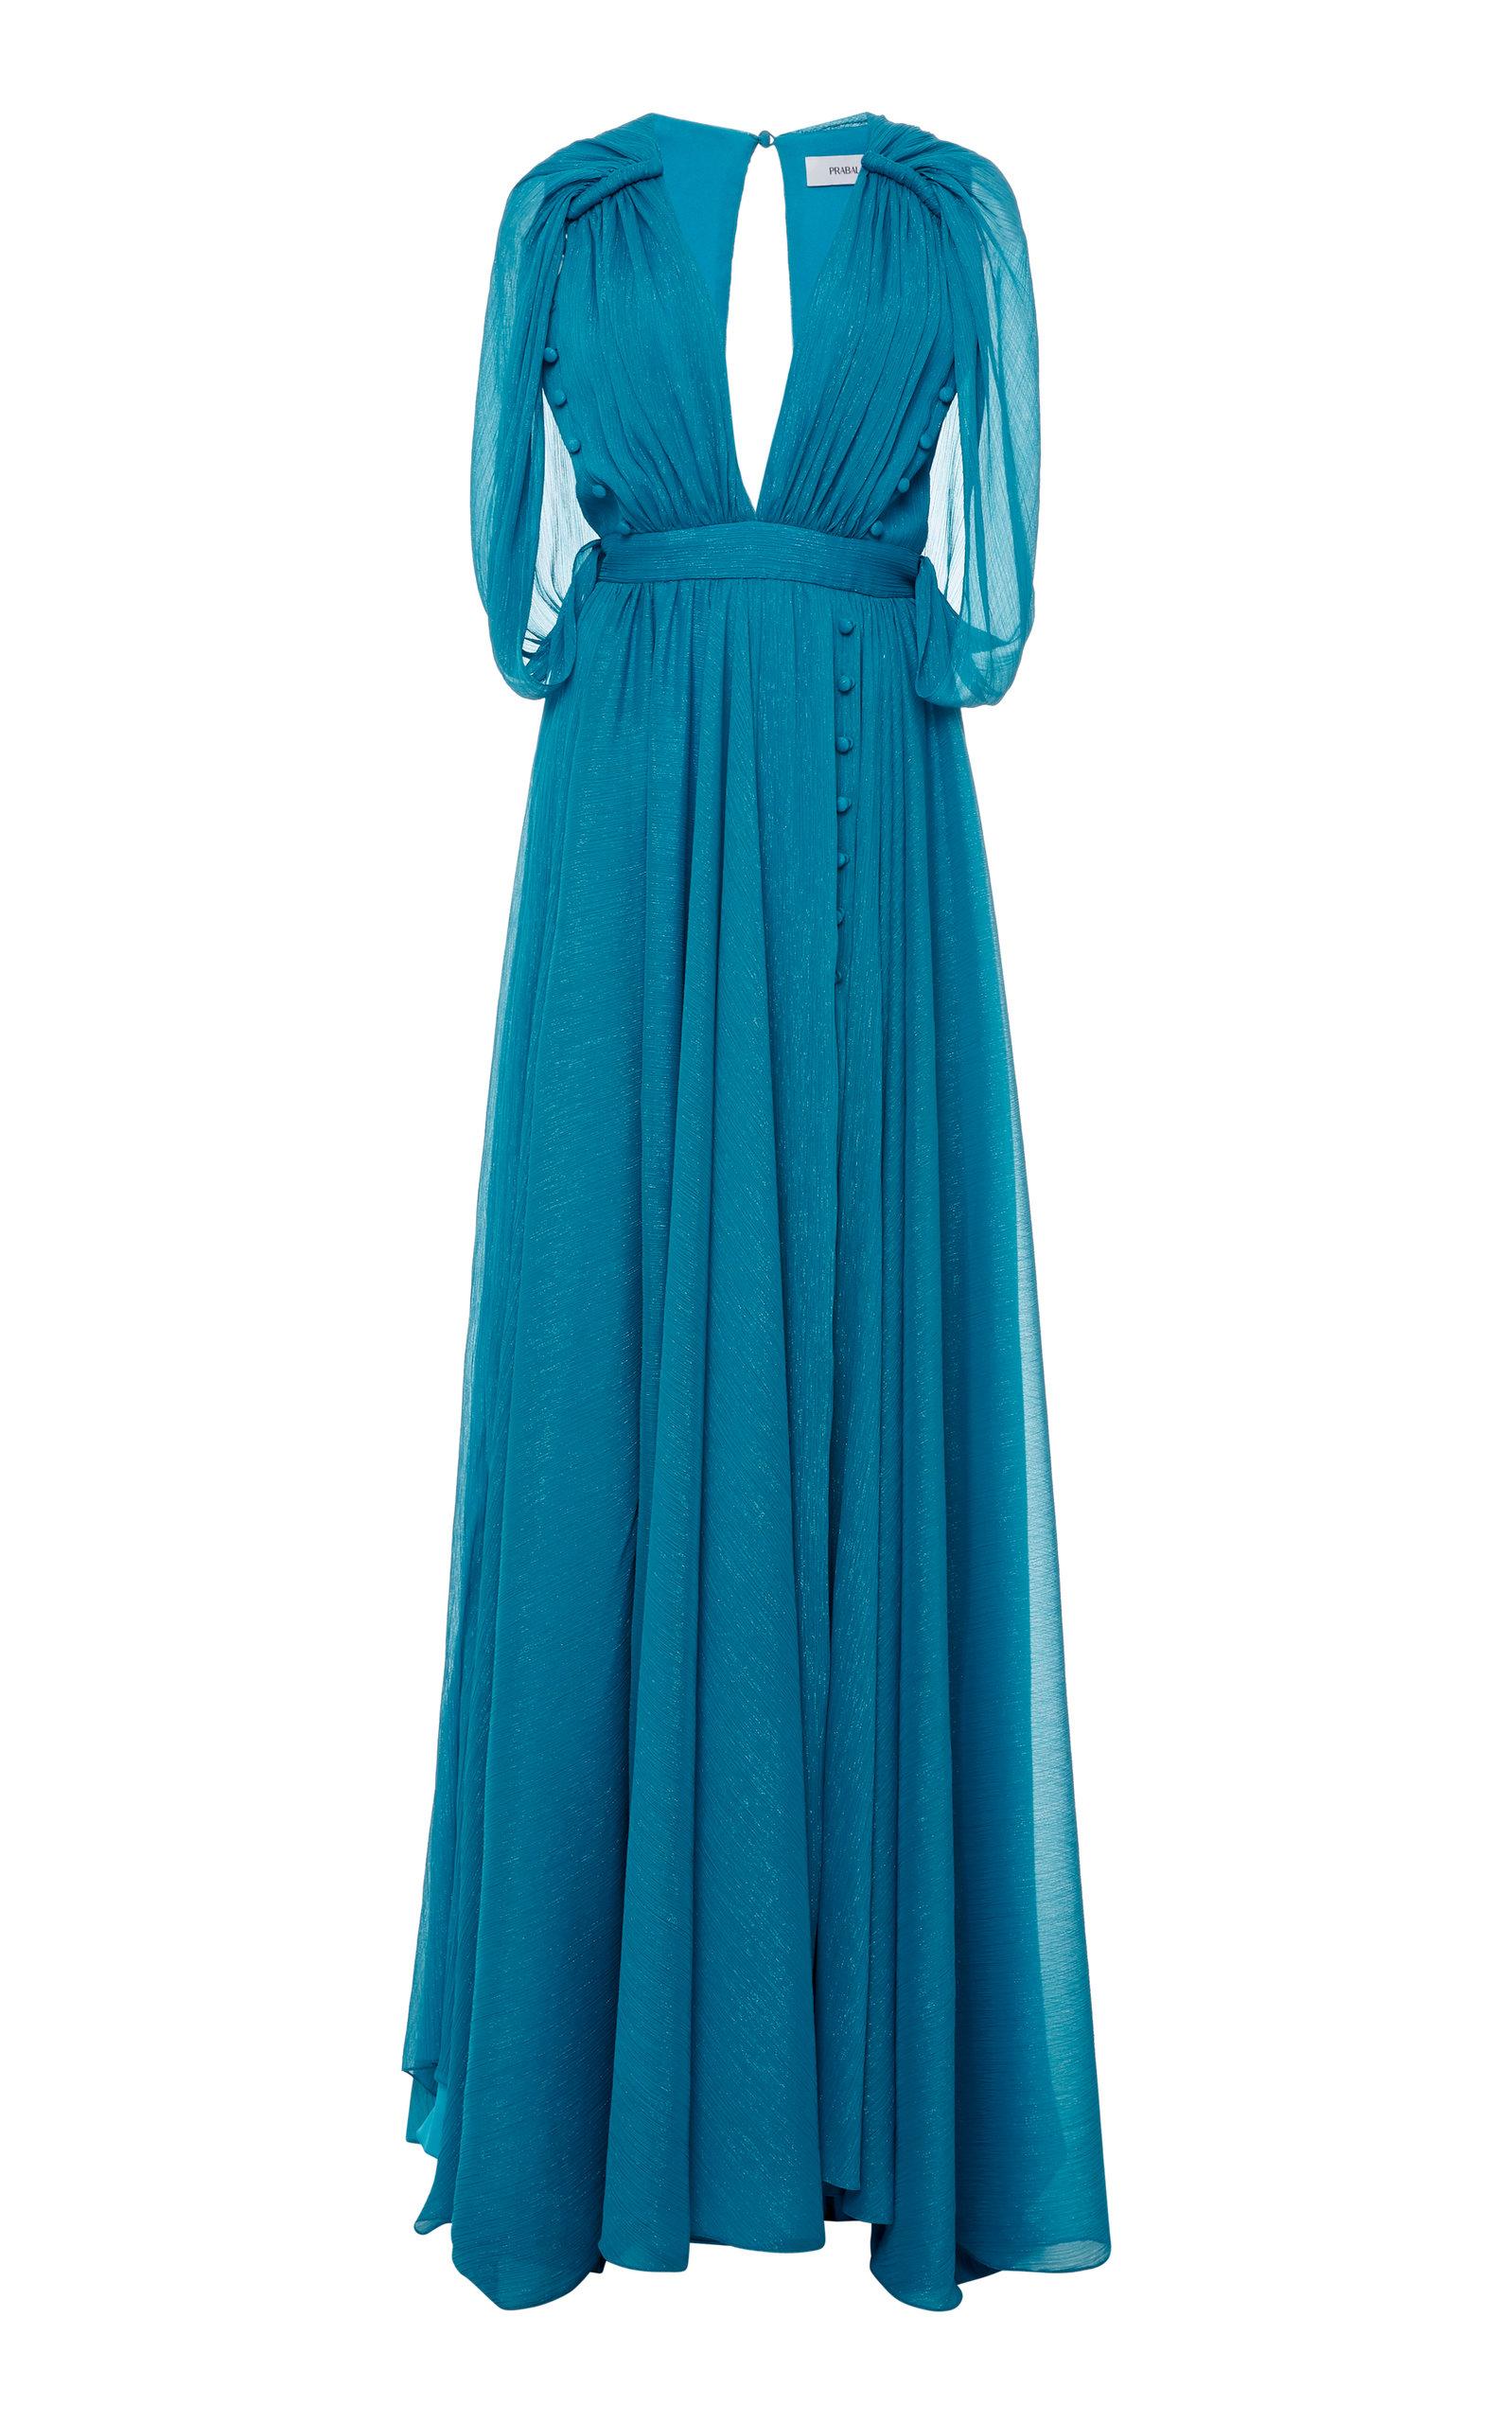 Grecian Cape Gown Prabal Gurung Shop For MNbloQllZ